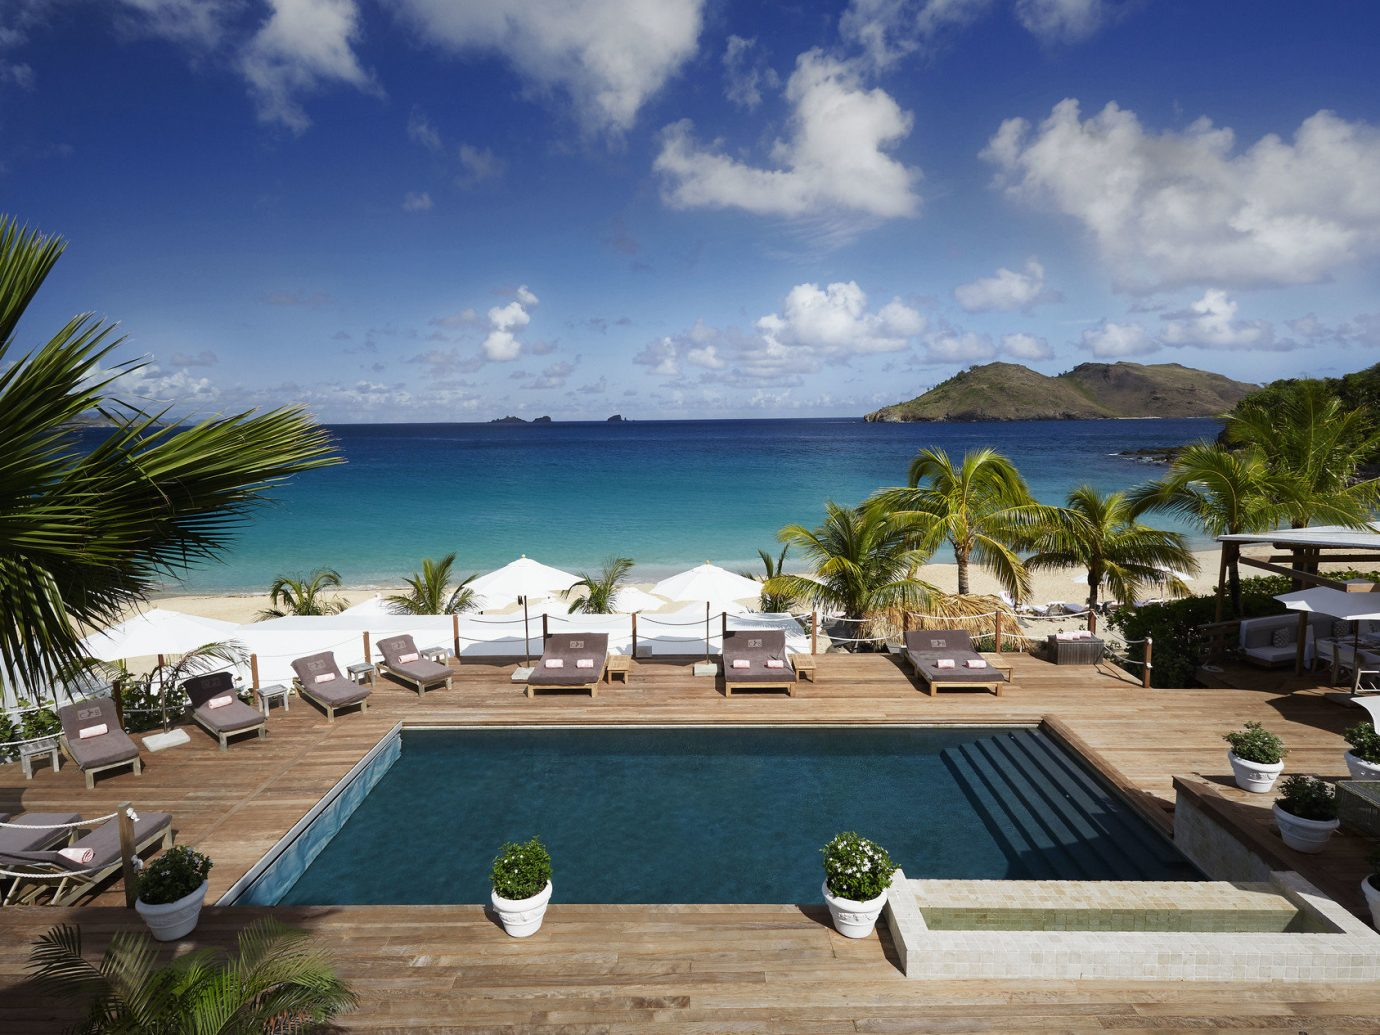 Cheval Blanc St Barth Isle de France Caribbean